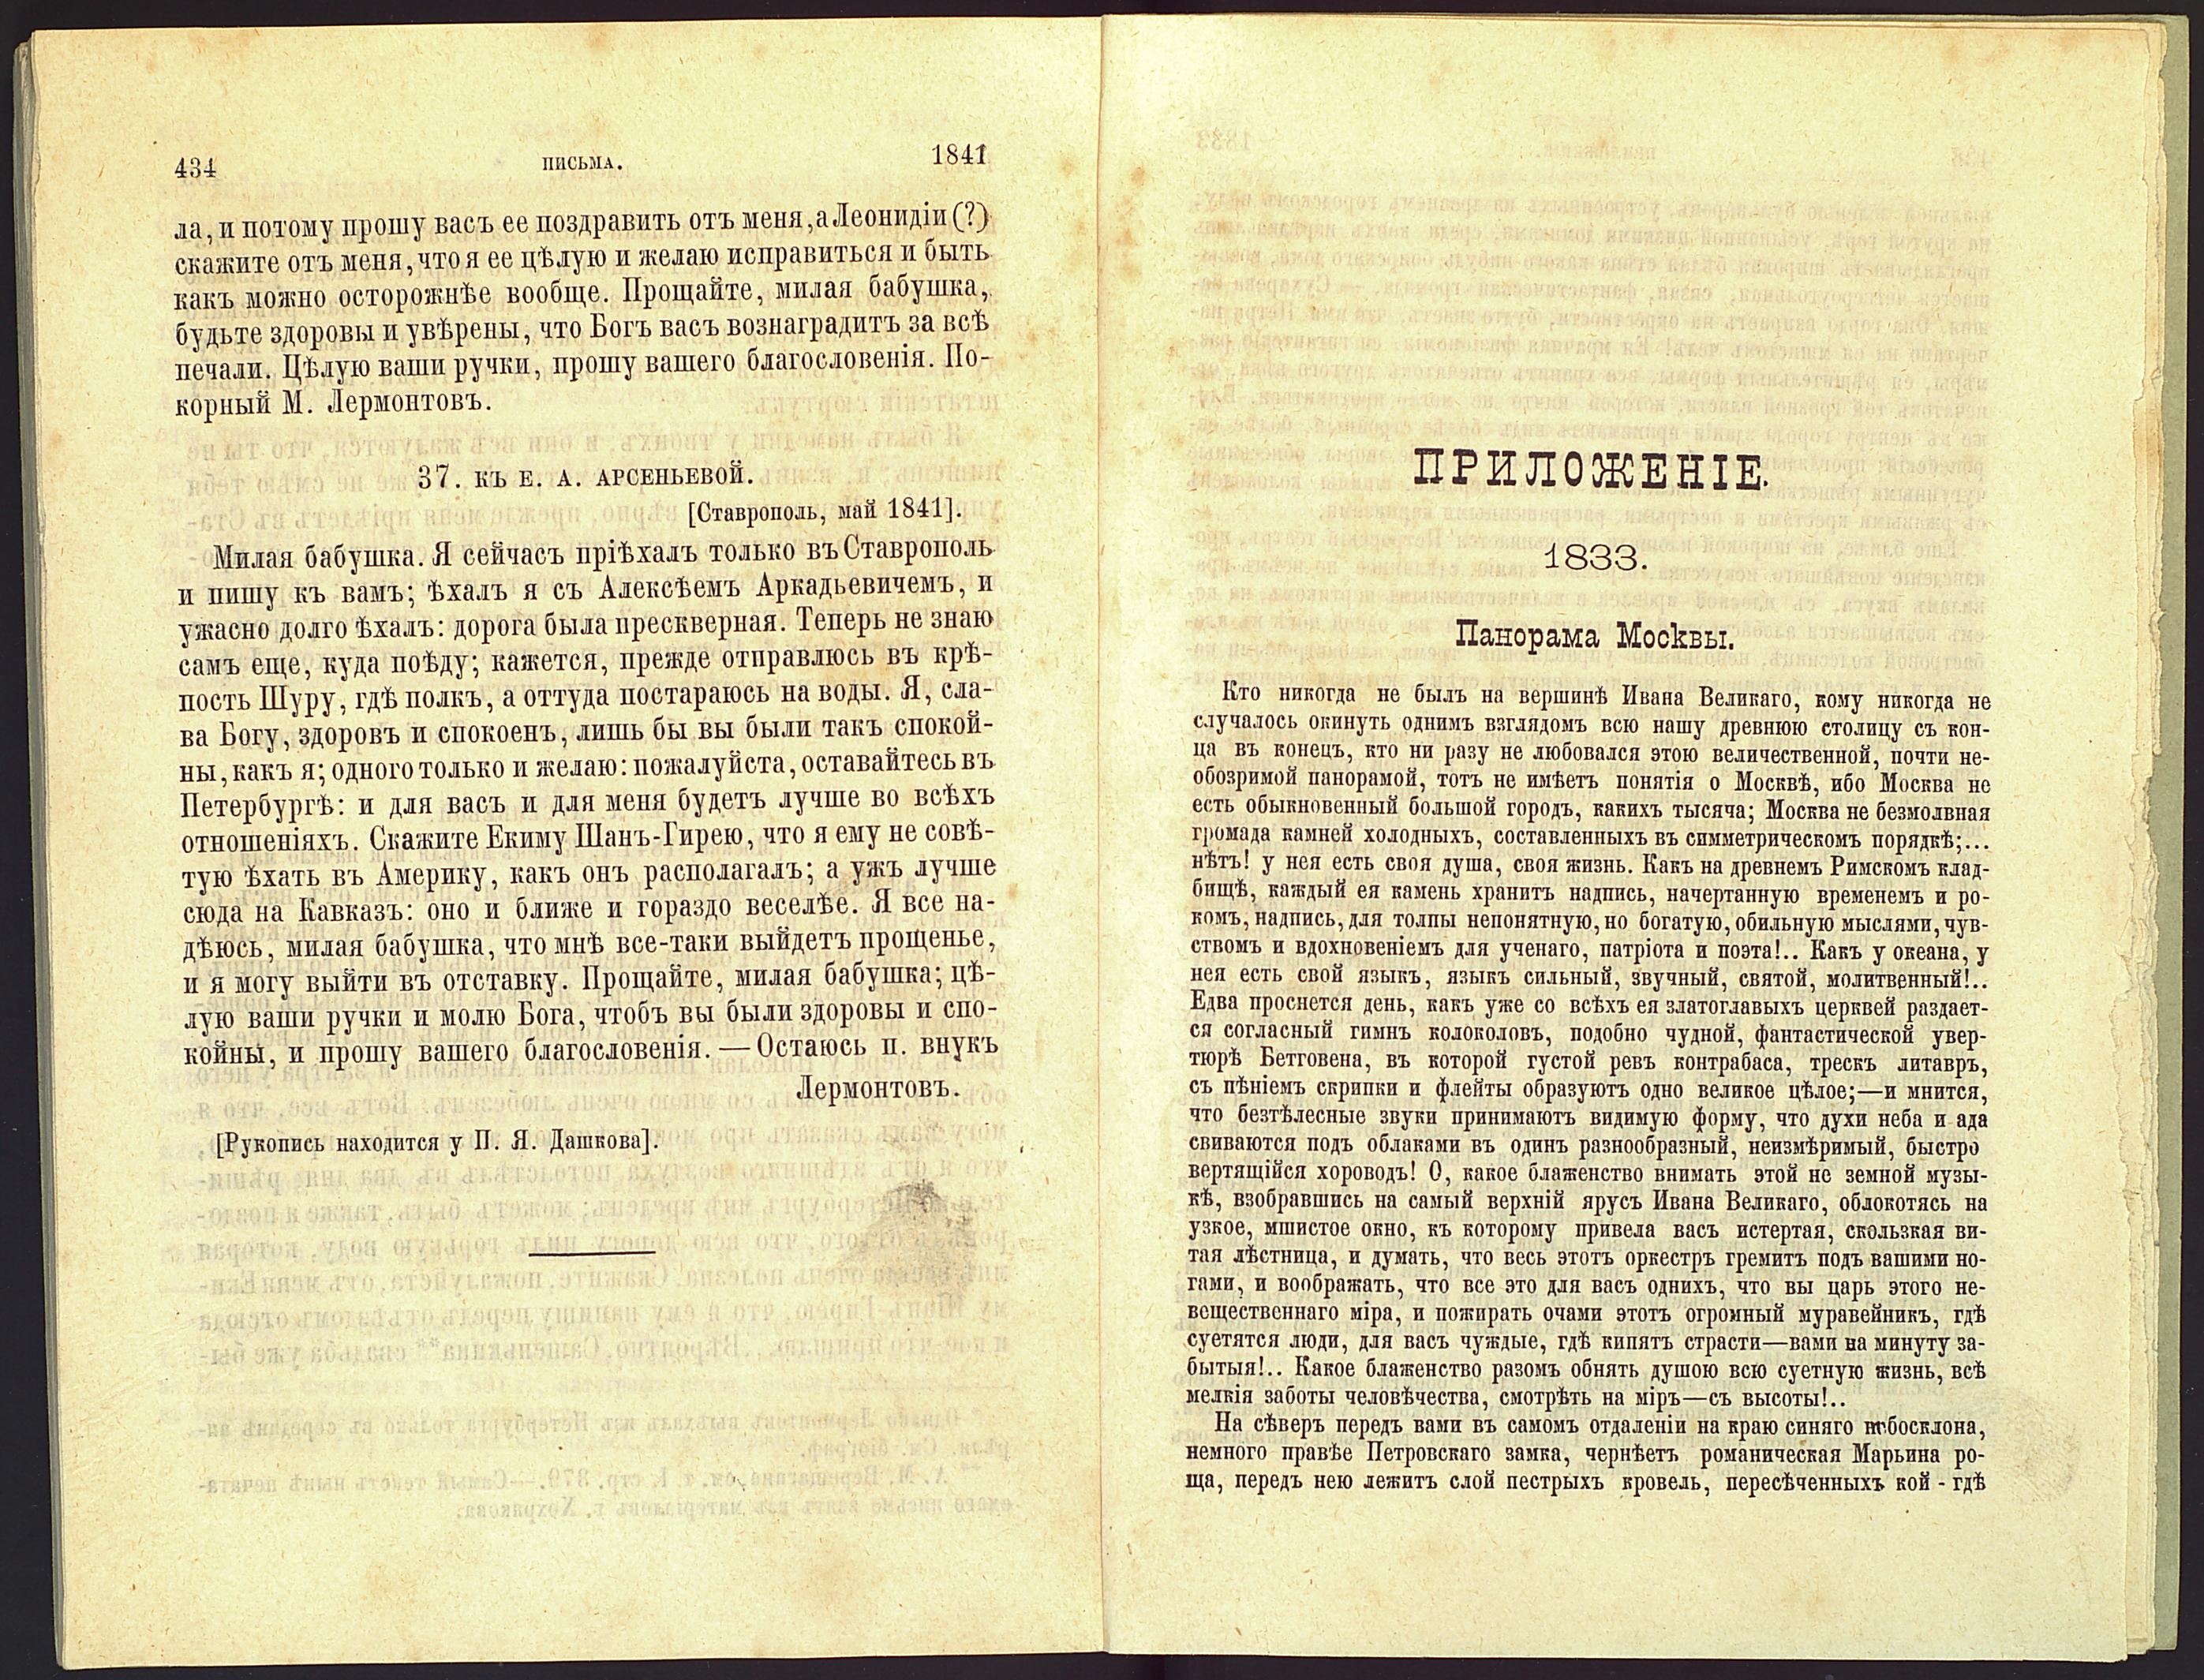 ЛОК-1819 ТАРХАНЫ КП-3642 М.Ю. Лермонтов Книга Сочинения. Т. 5._4